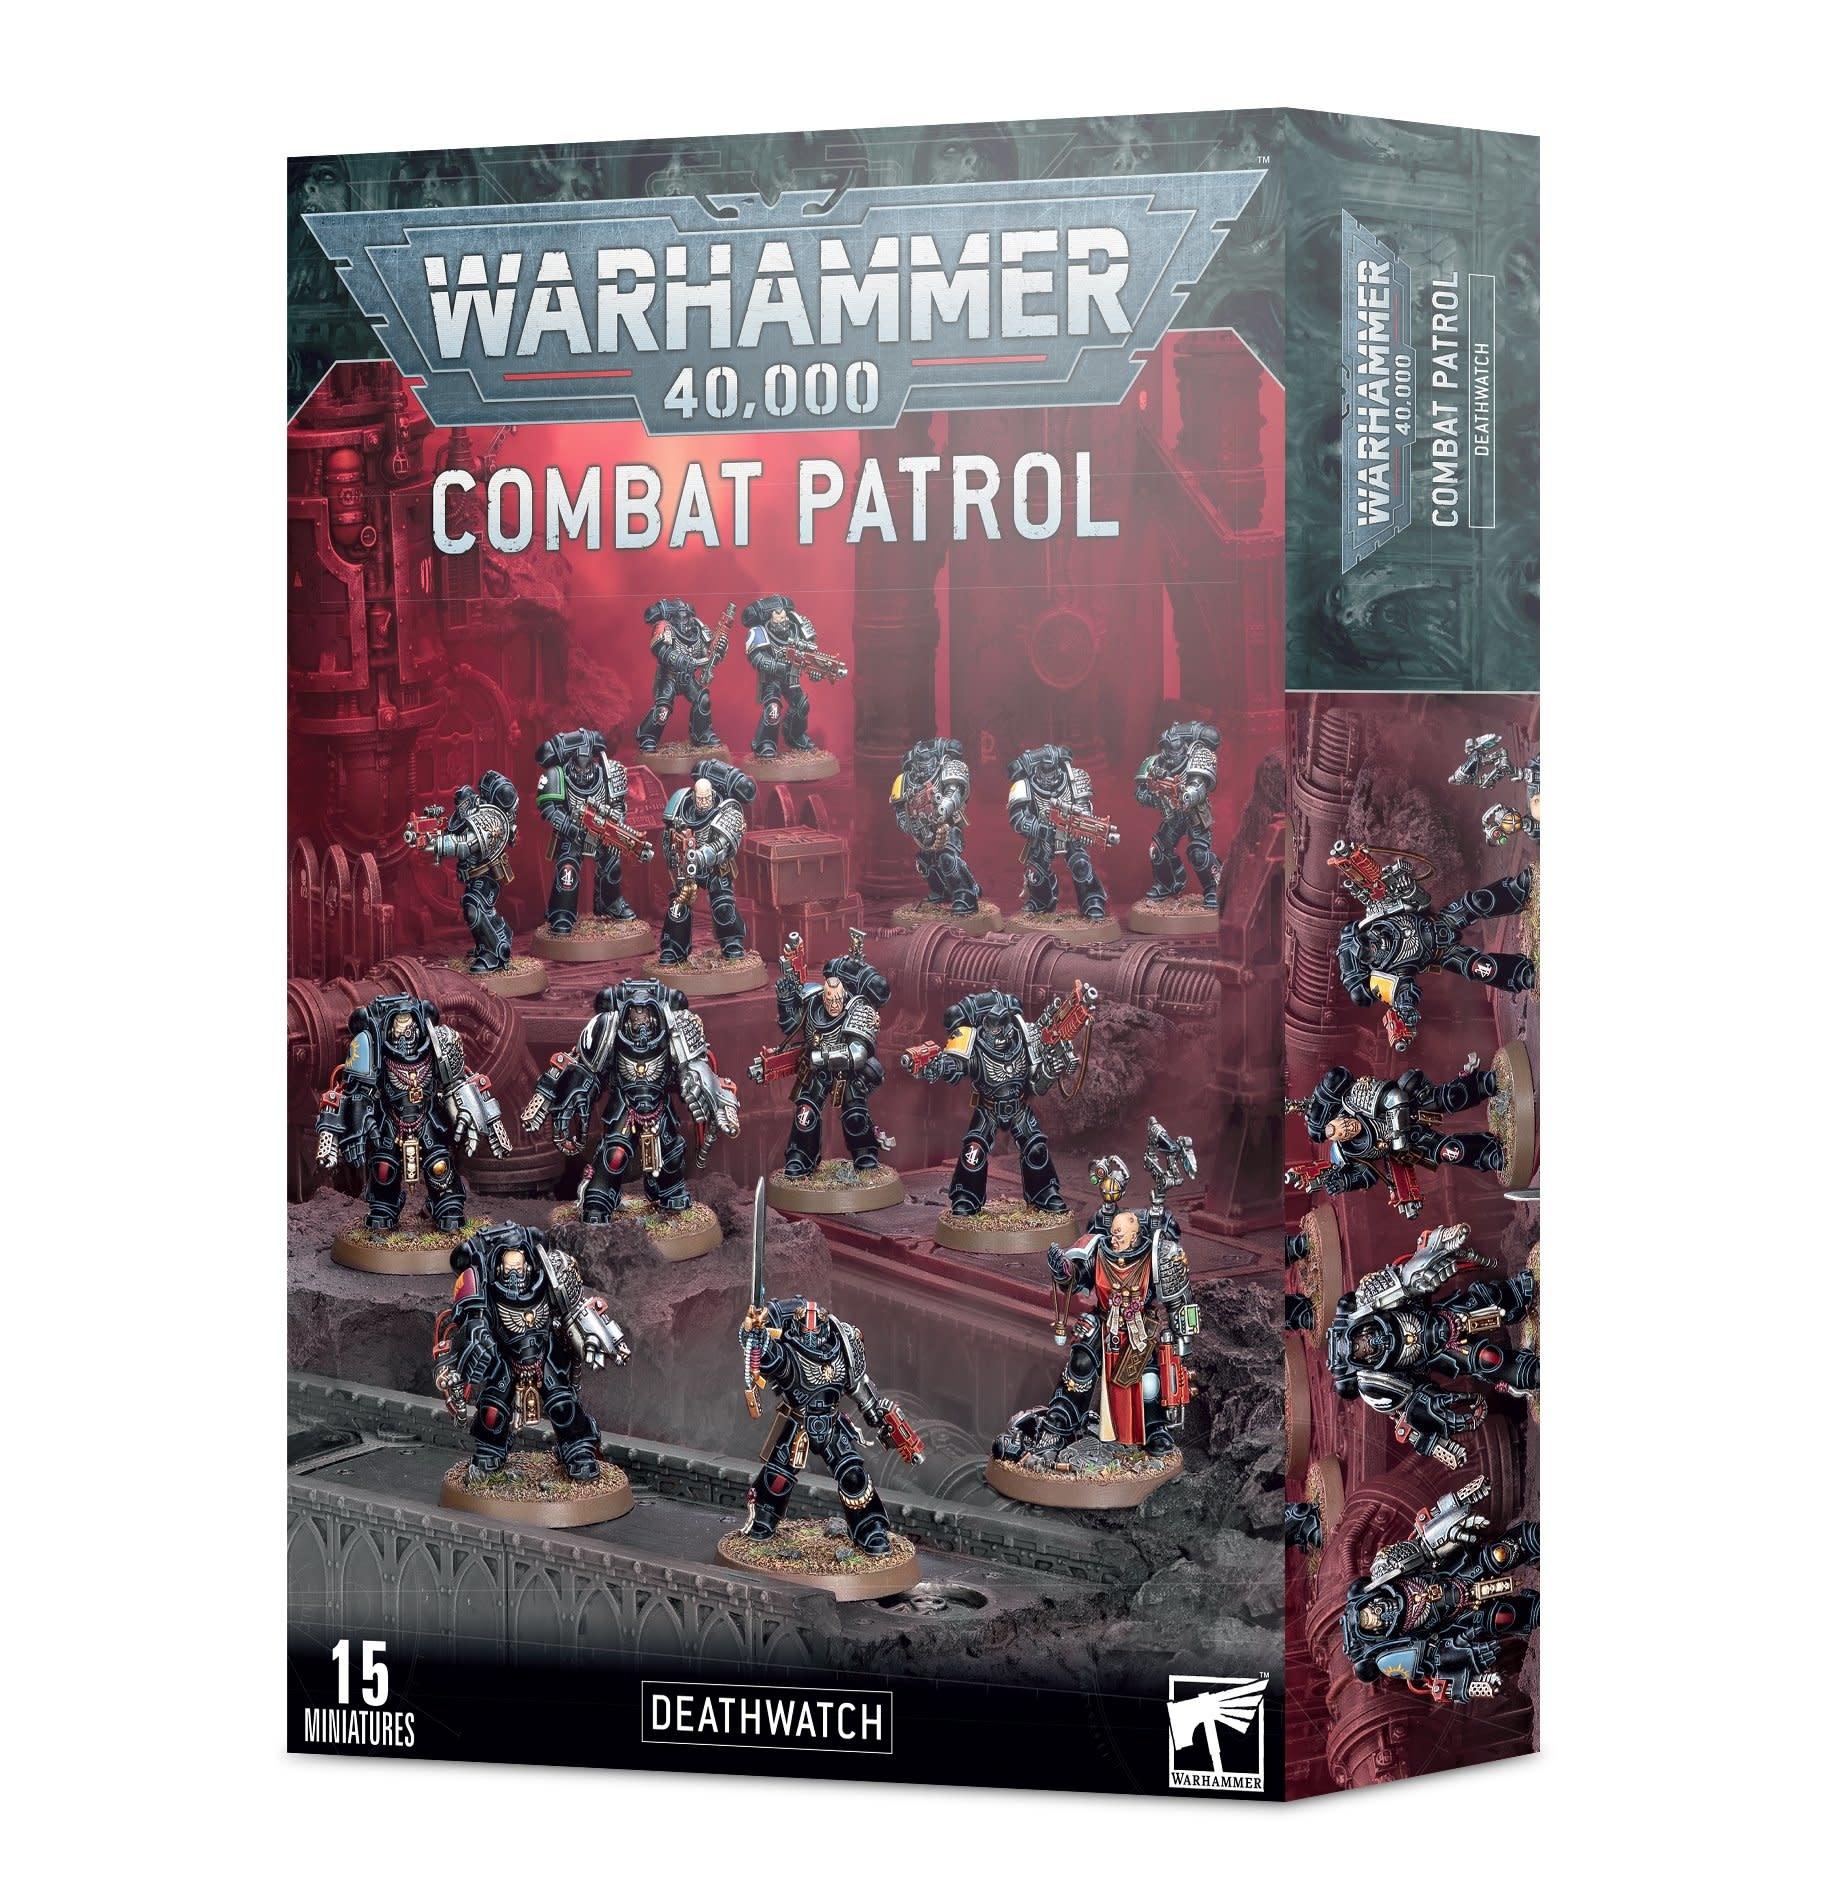 Games-Workshop Combat Patrol: Deathwatch